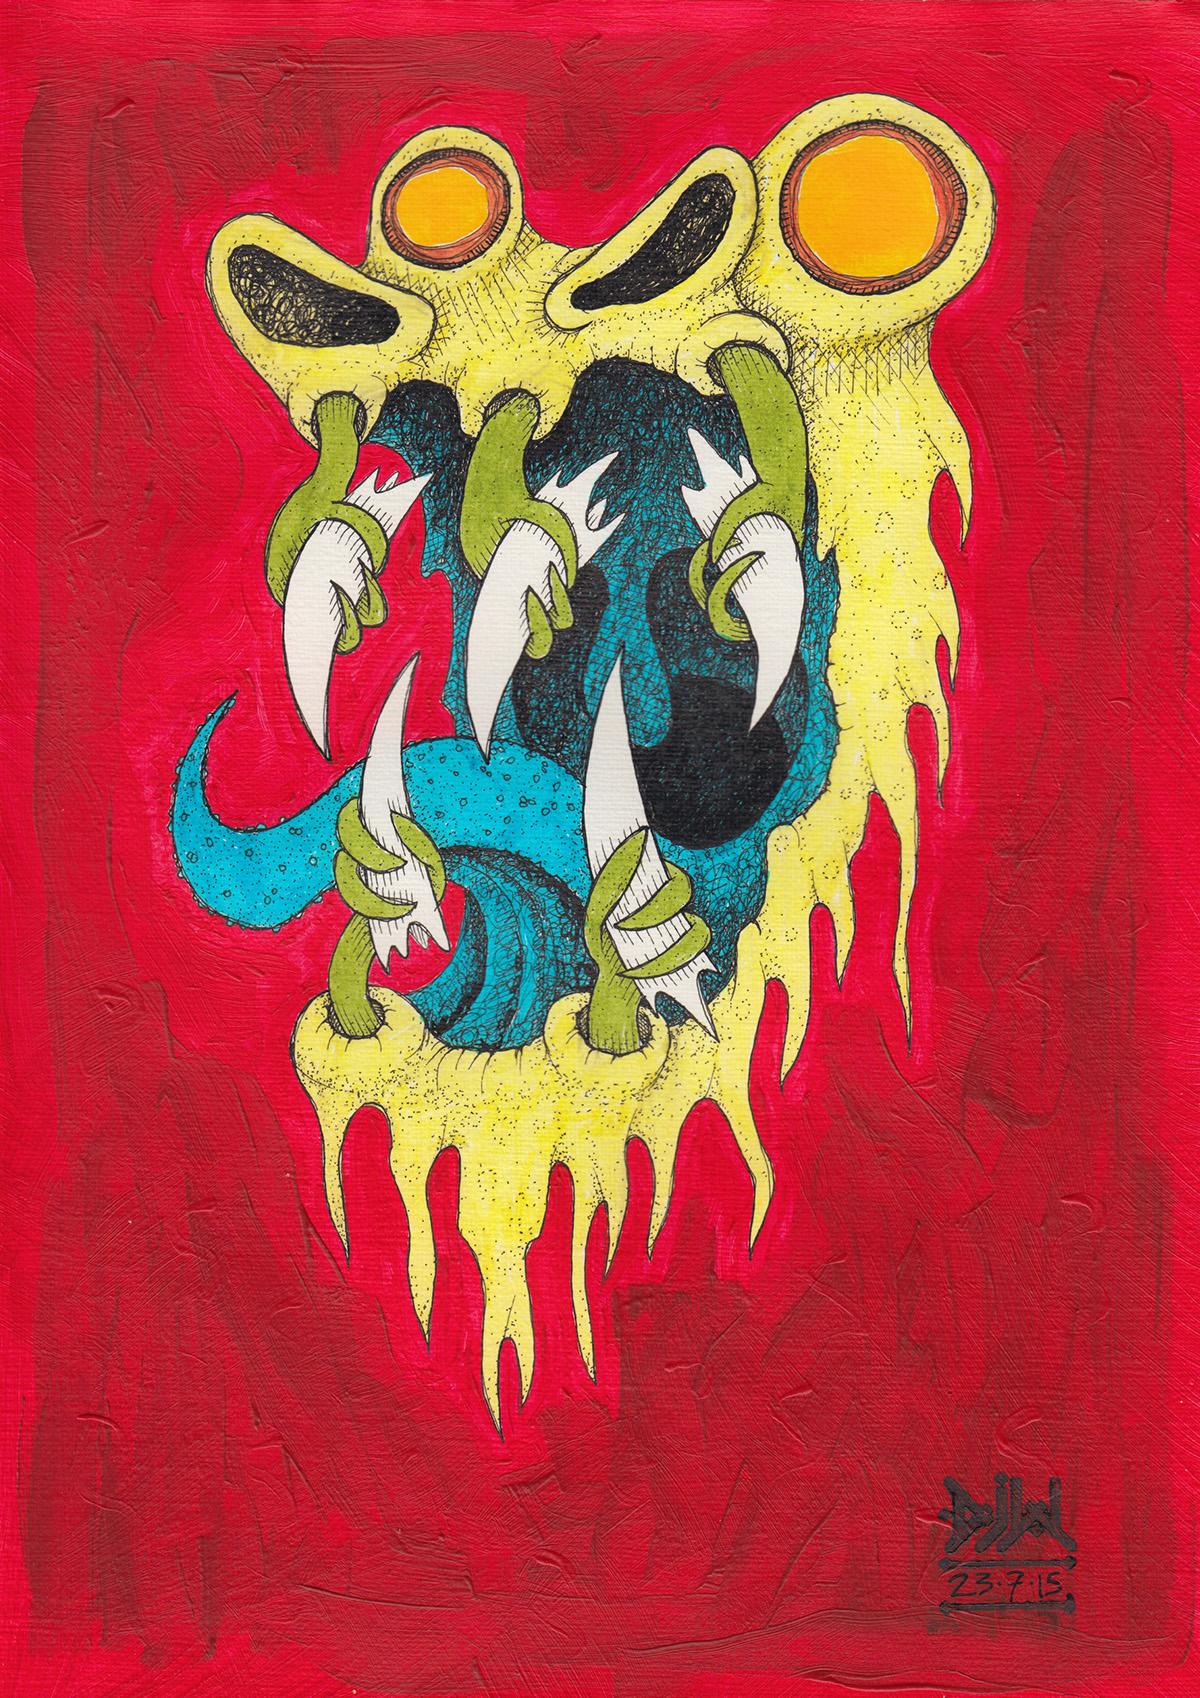 fangs monster phantom ghost demon claw paint ink